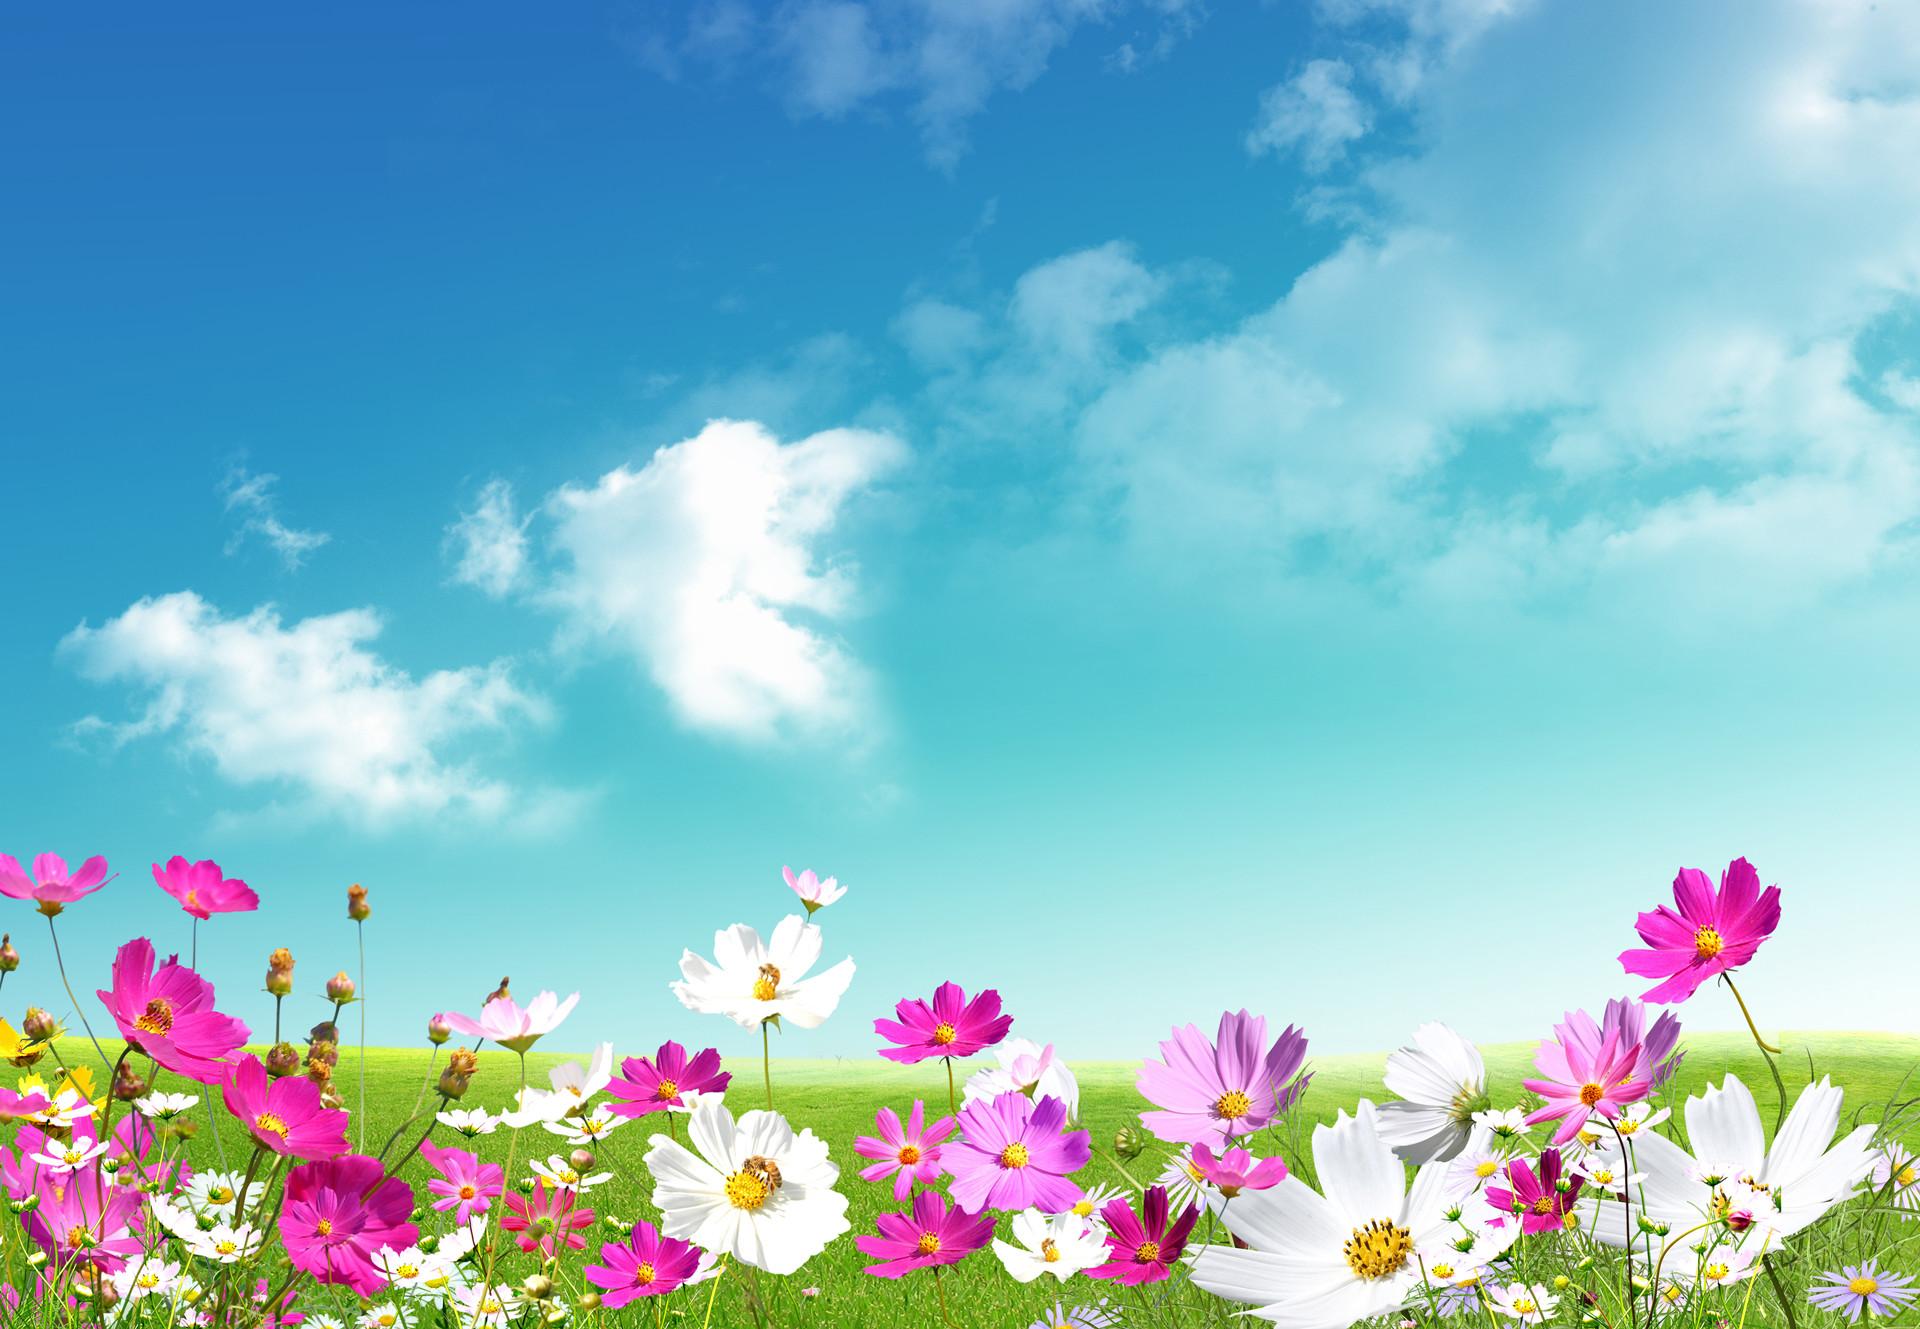 Spring 59, Free Wallpapers, Free Desktop Wallpapers, HD Wallpapers